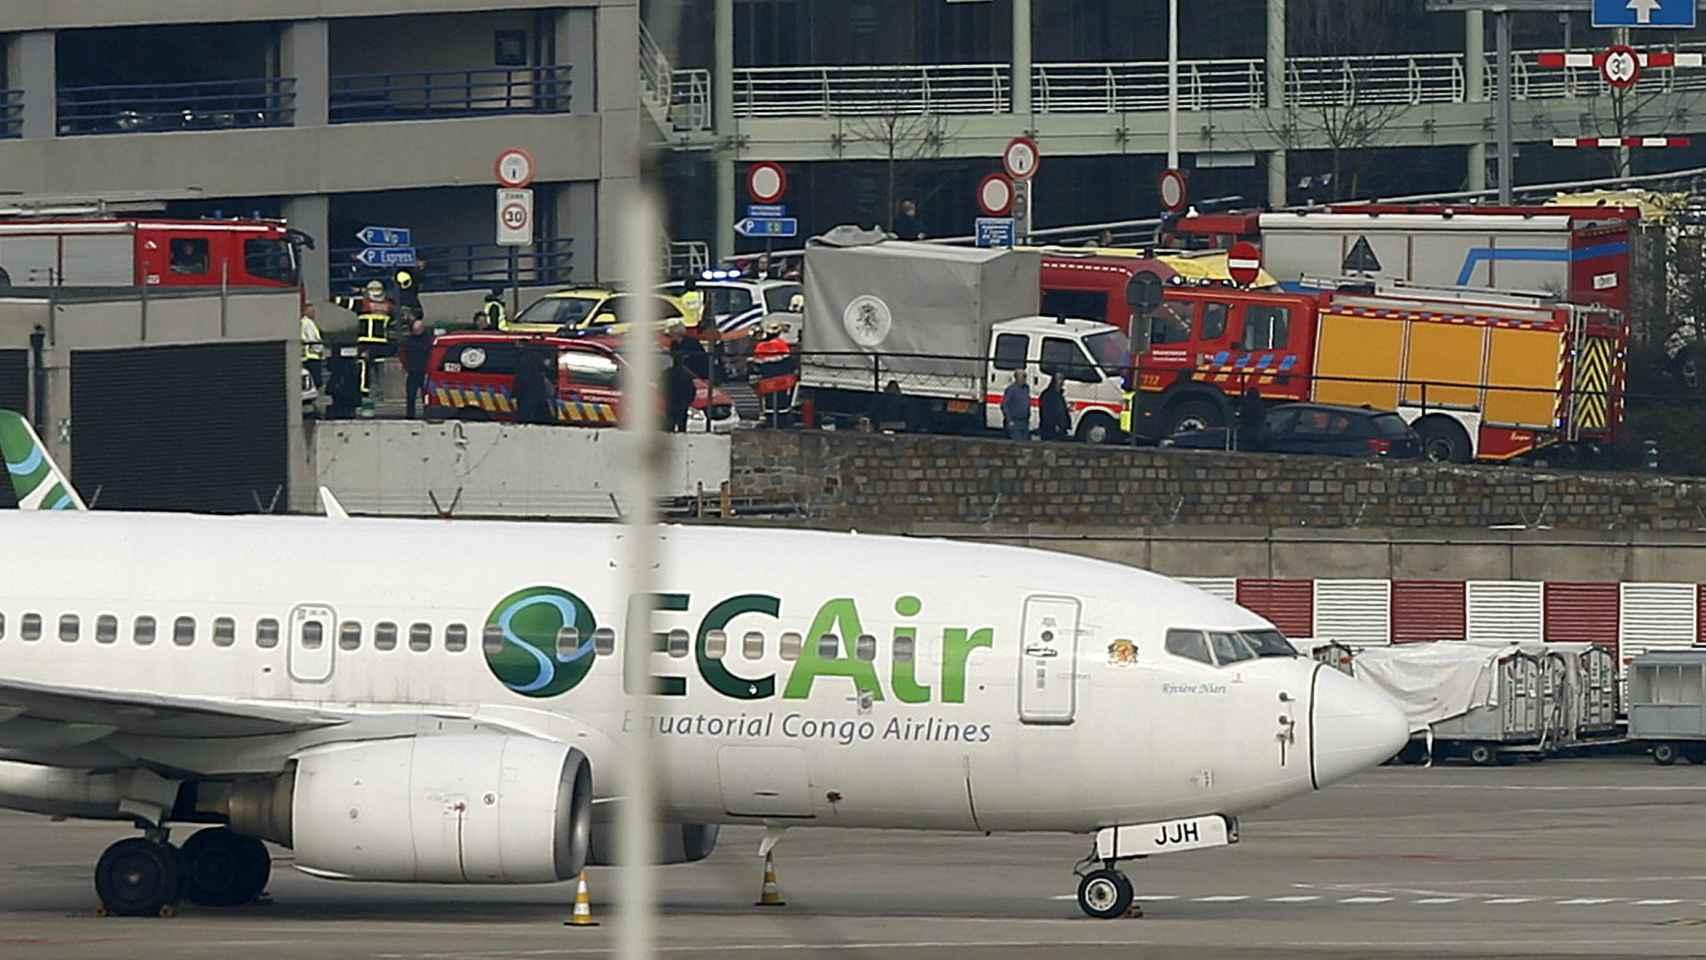 Imagen del aeropuerto de Zaventem en Bruselas.